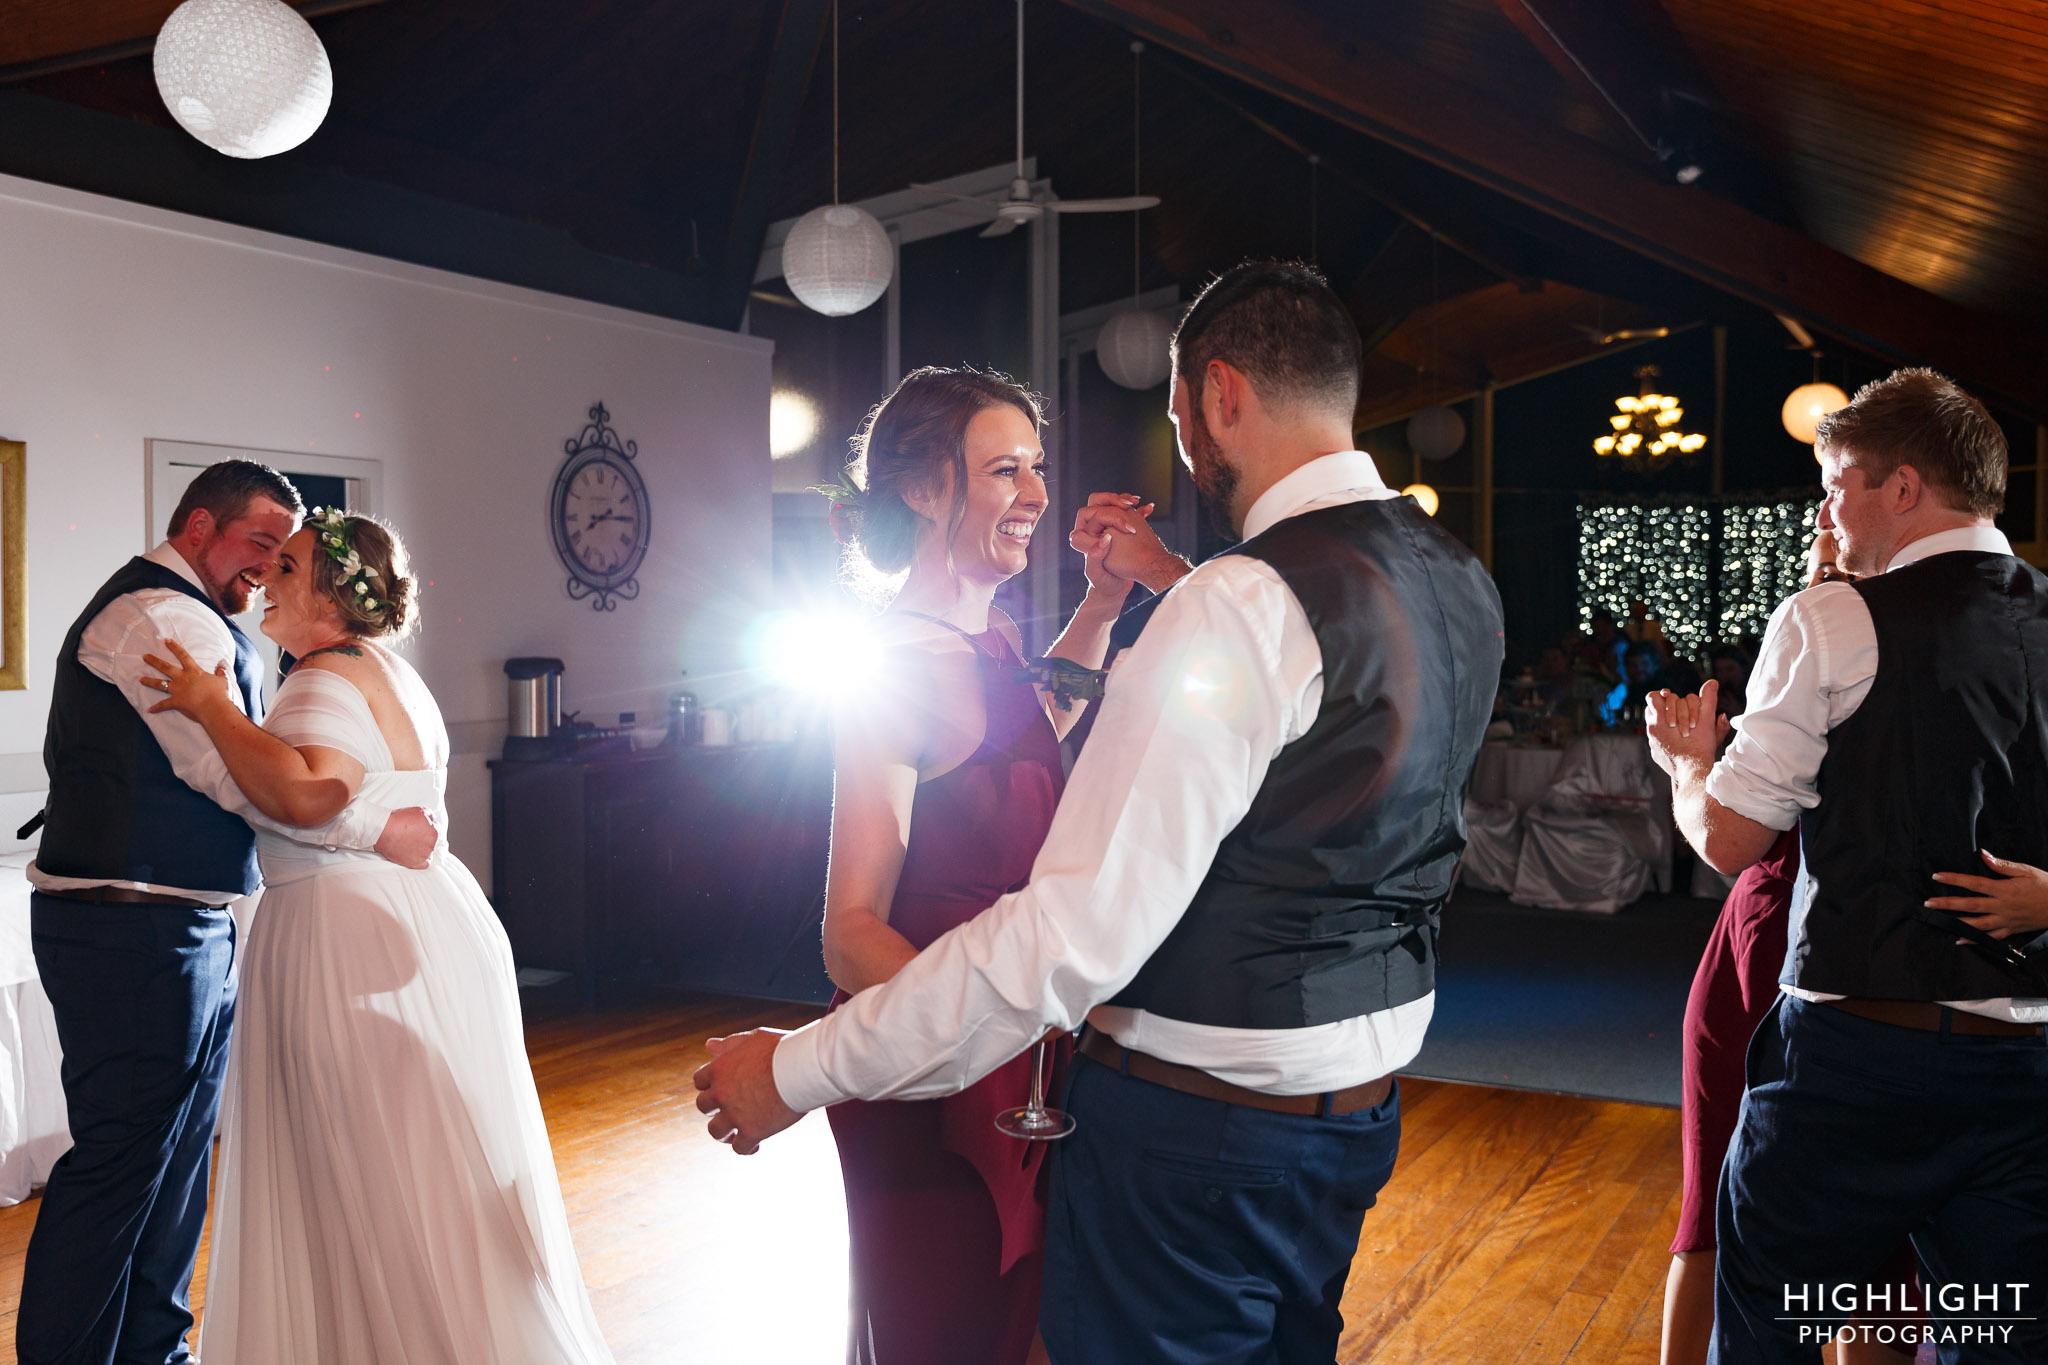 Highlight-wedding-photography-new-zealand-palmerston-north-131.jpg